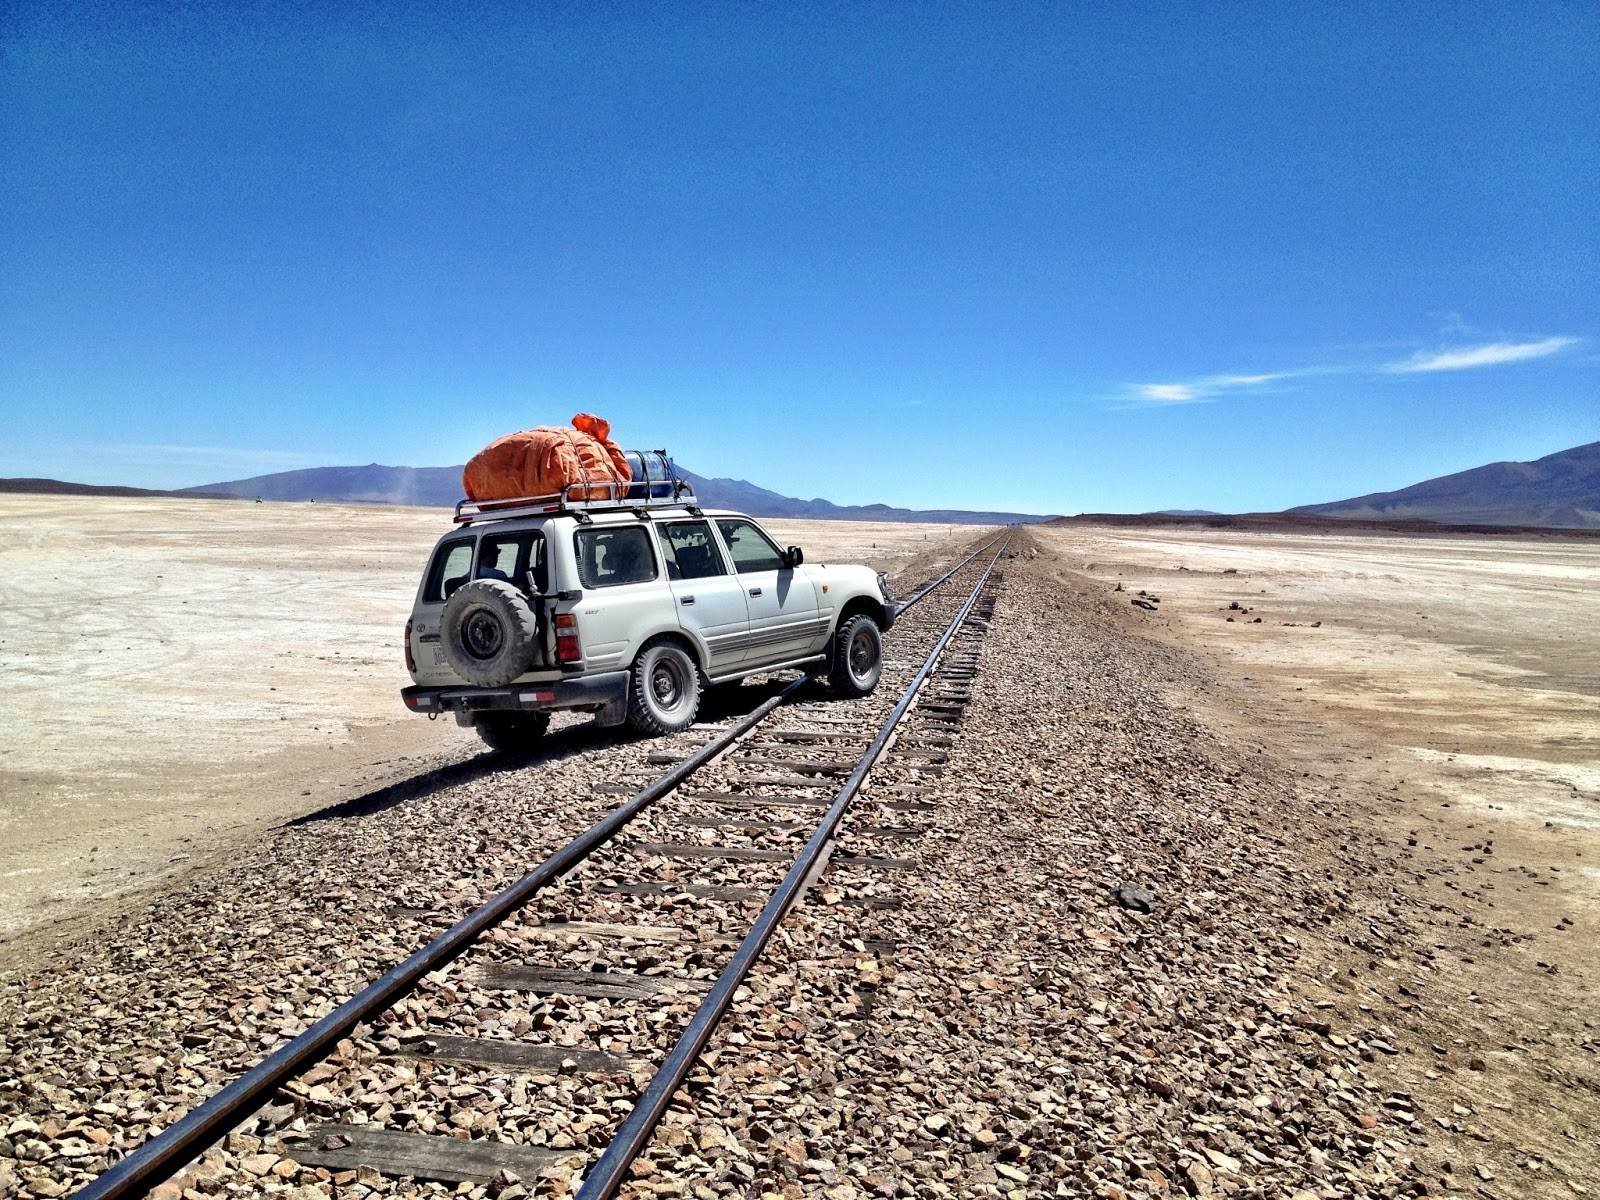 Crossing a train track - Salar de Uyuni, Bolivia